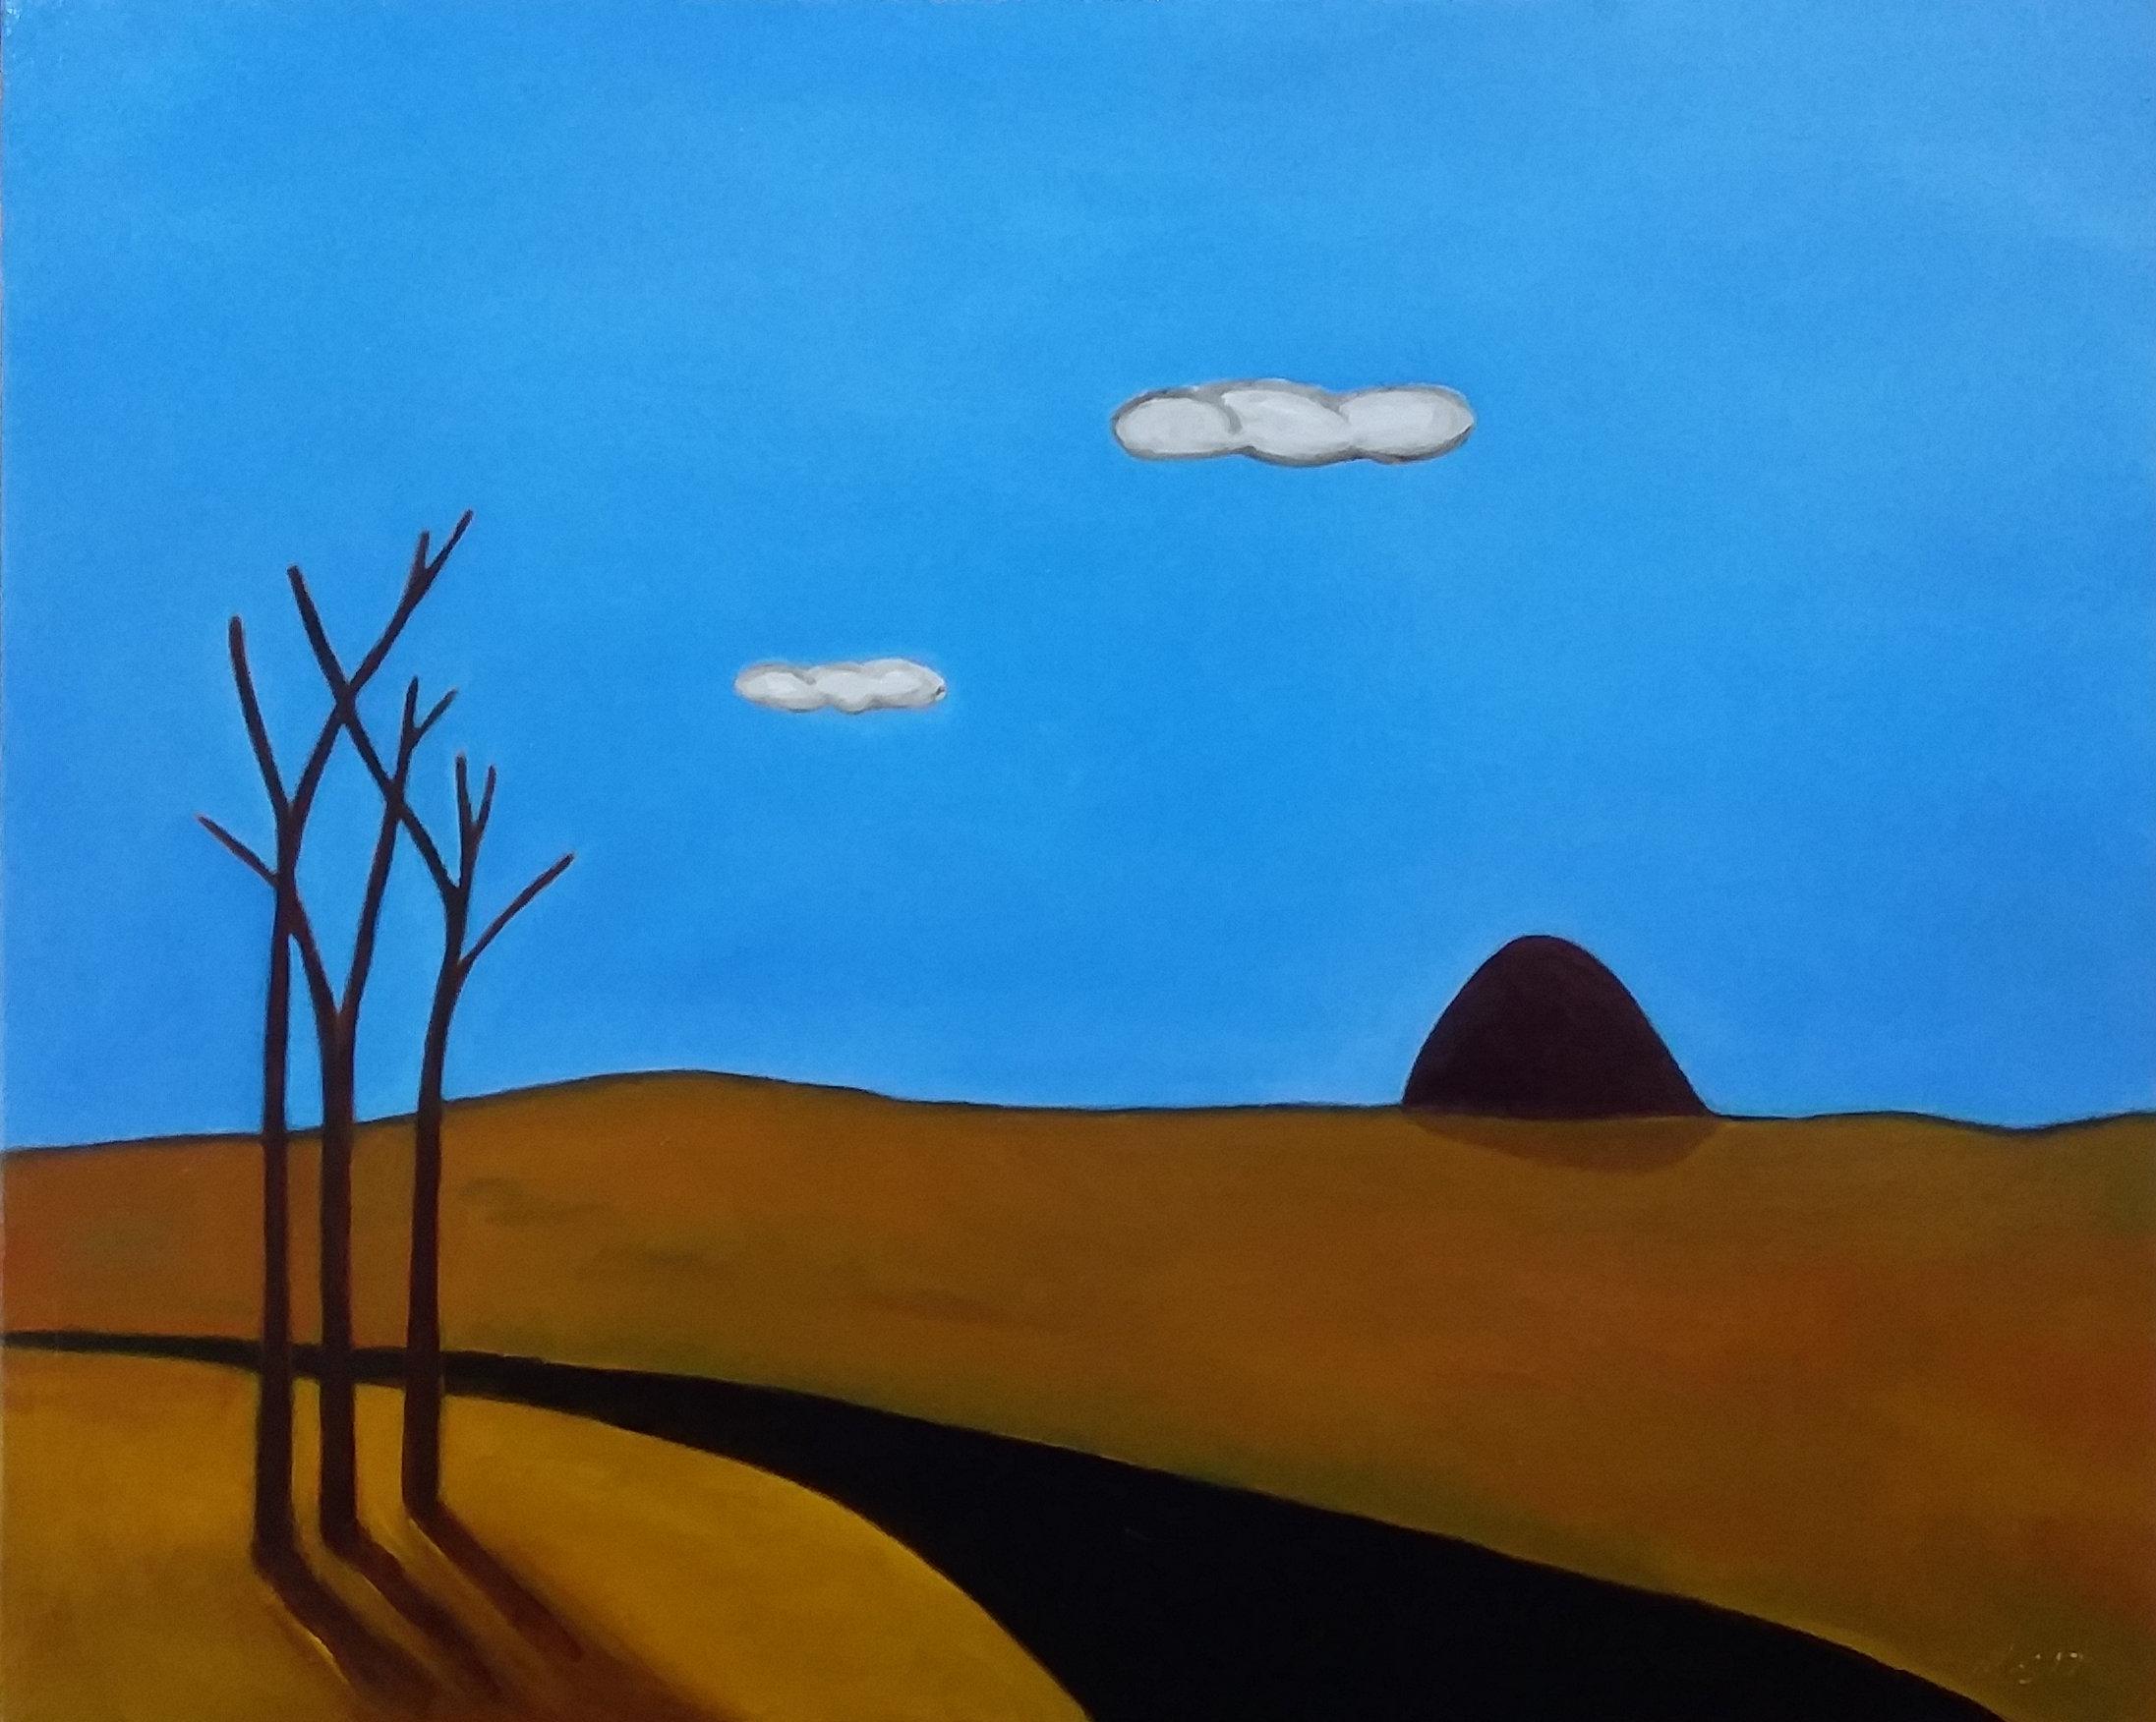 Malcolm Sands  Wollemi Landform Kandos  2018 oil on canvas 64 x 79.5cm